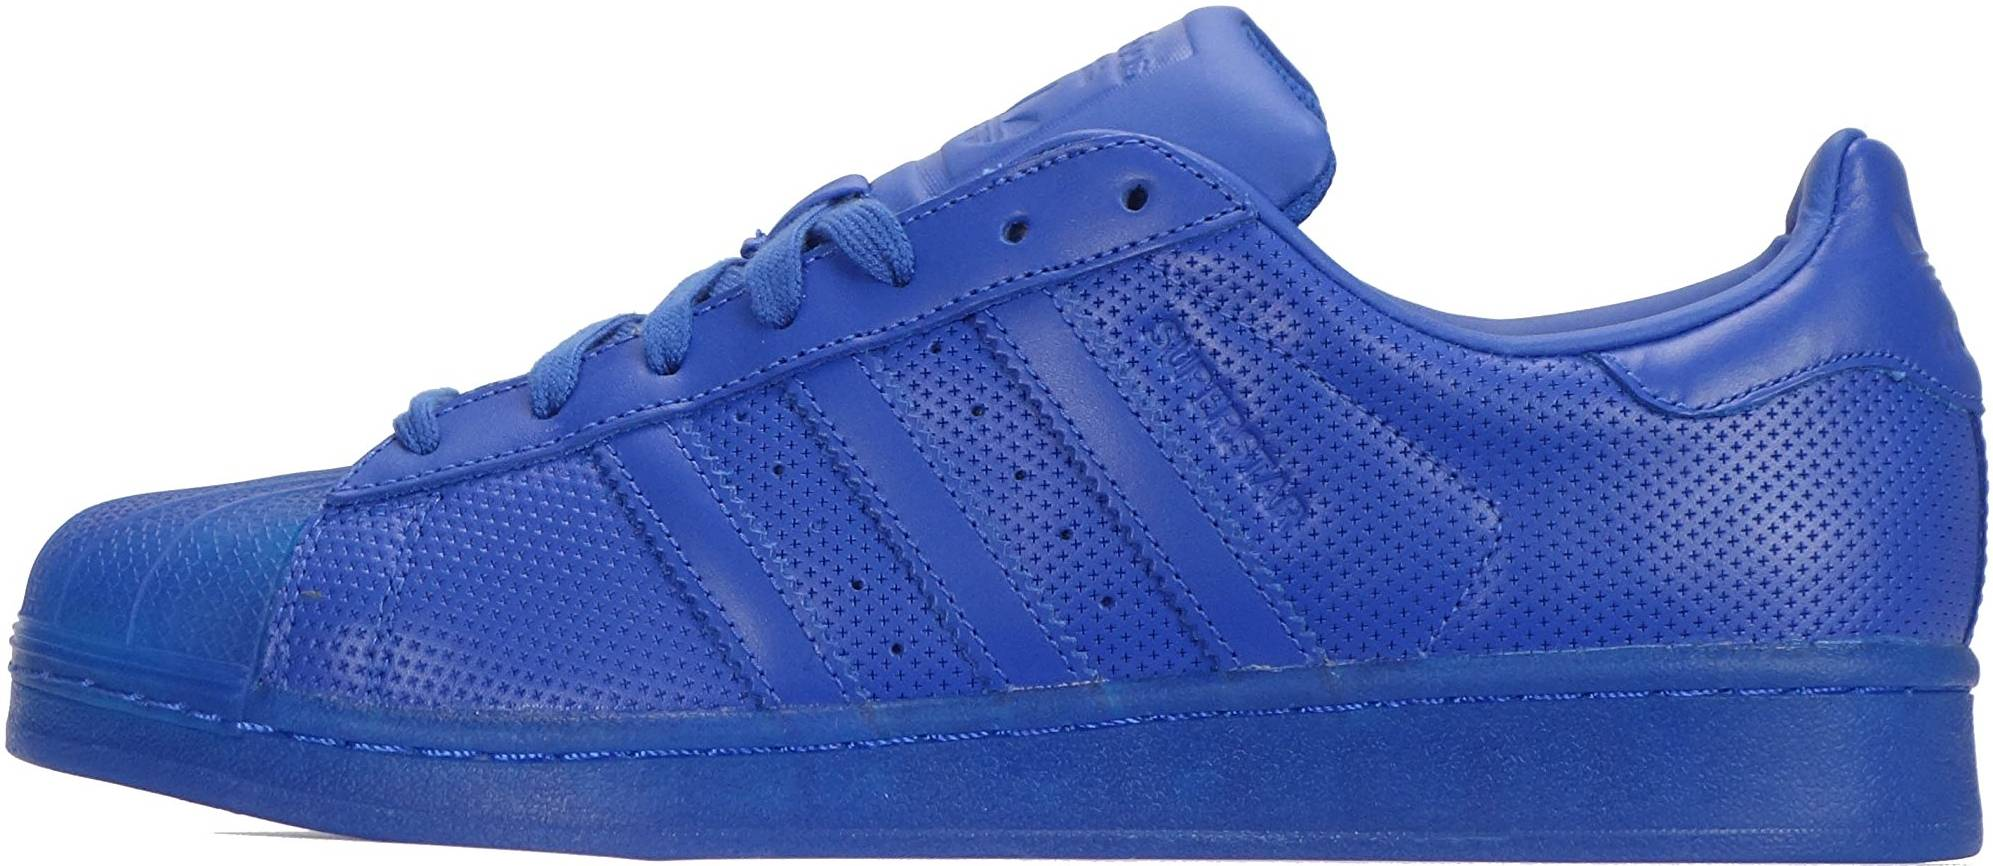 Joseph Banks da ora in poi Forum  Save 60% on Adidas Superstar Sneakers (34 Models in Stock) | RunRepeat